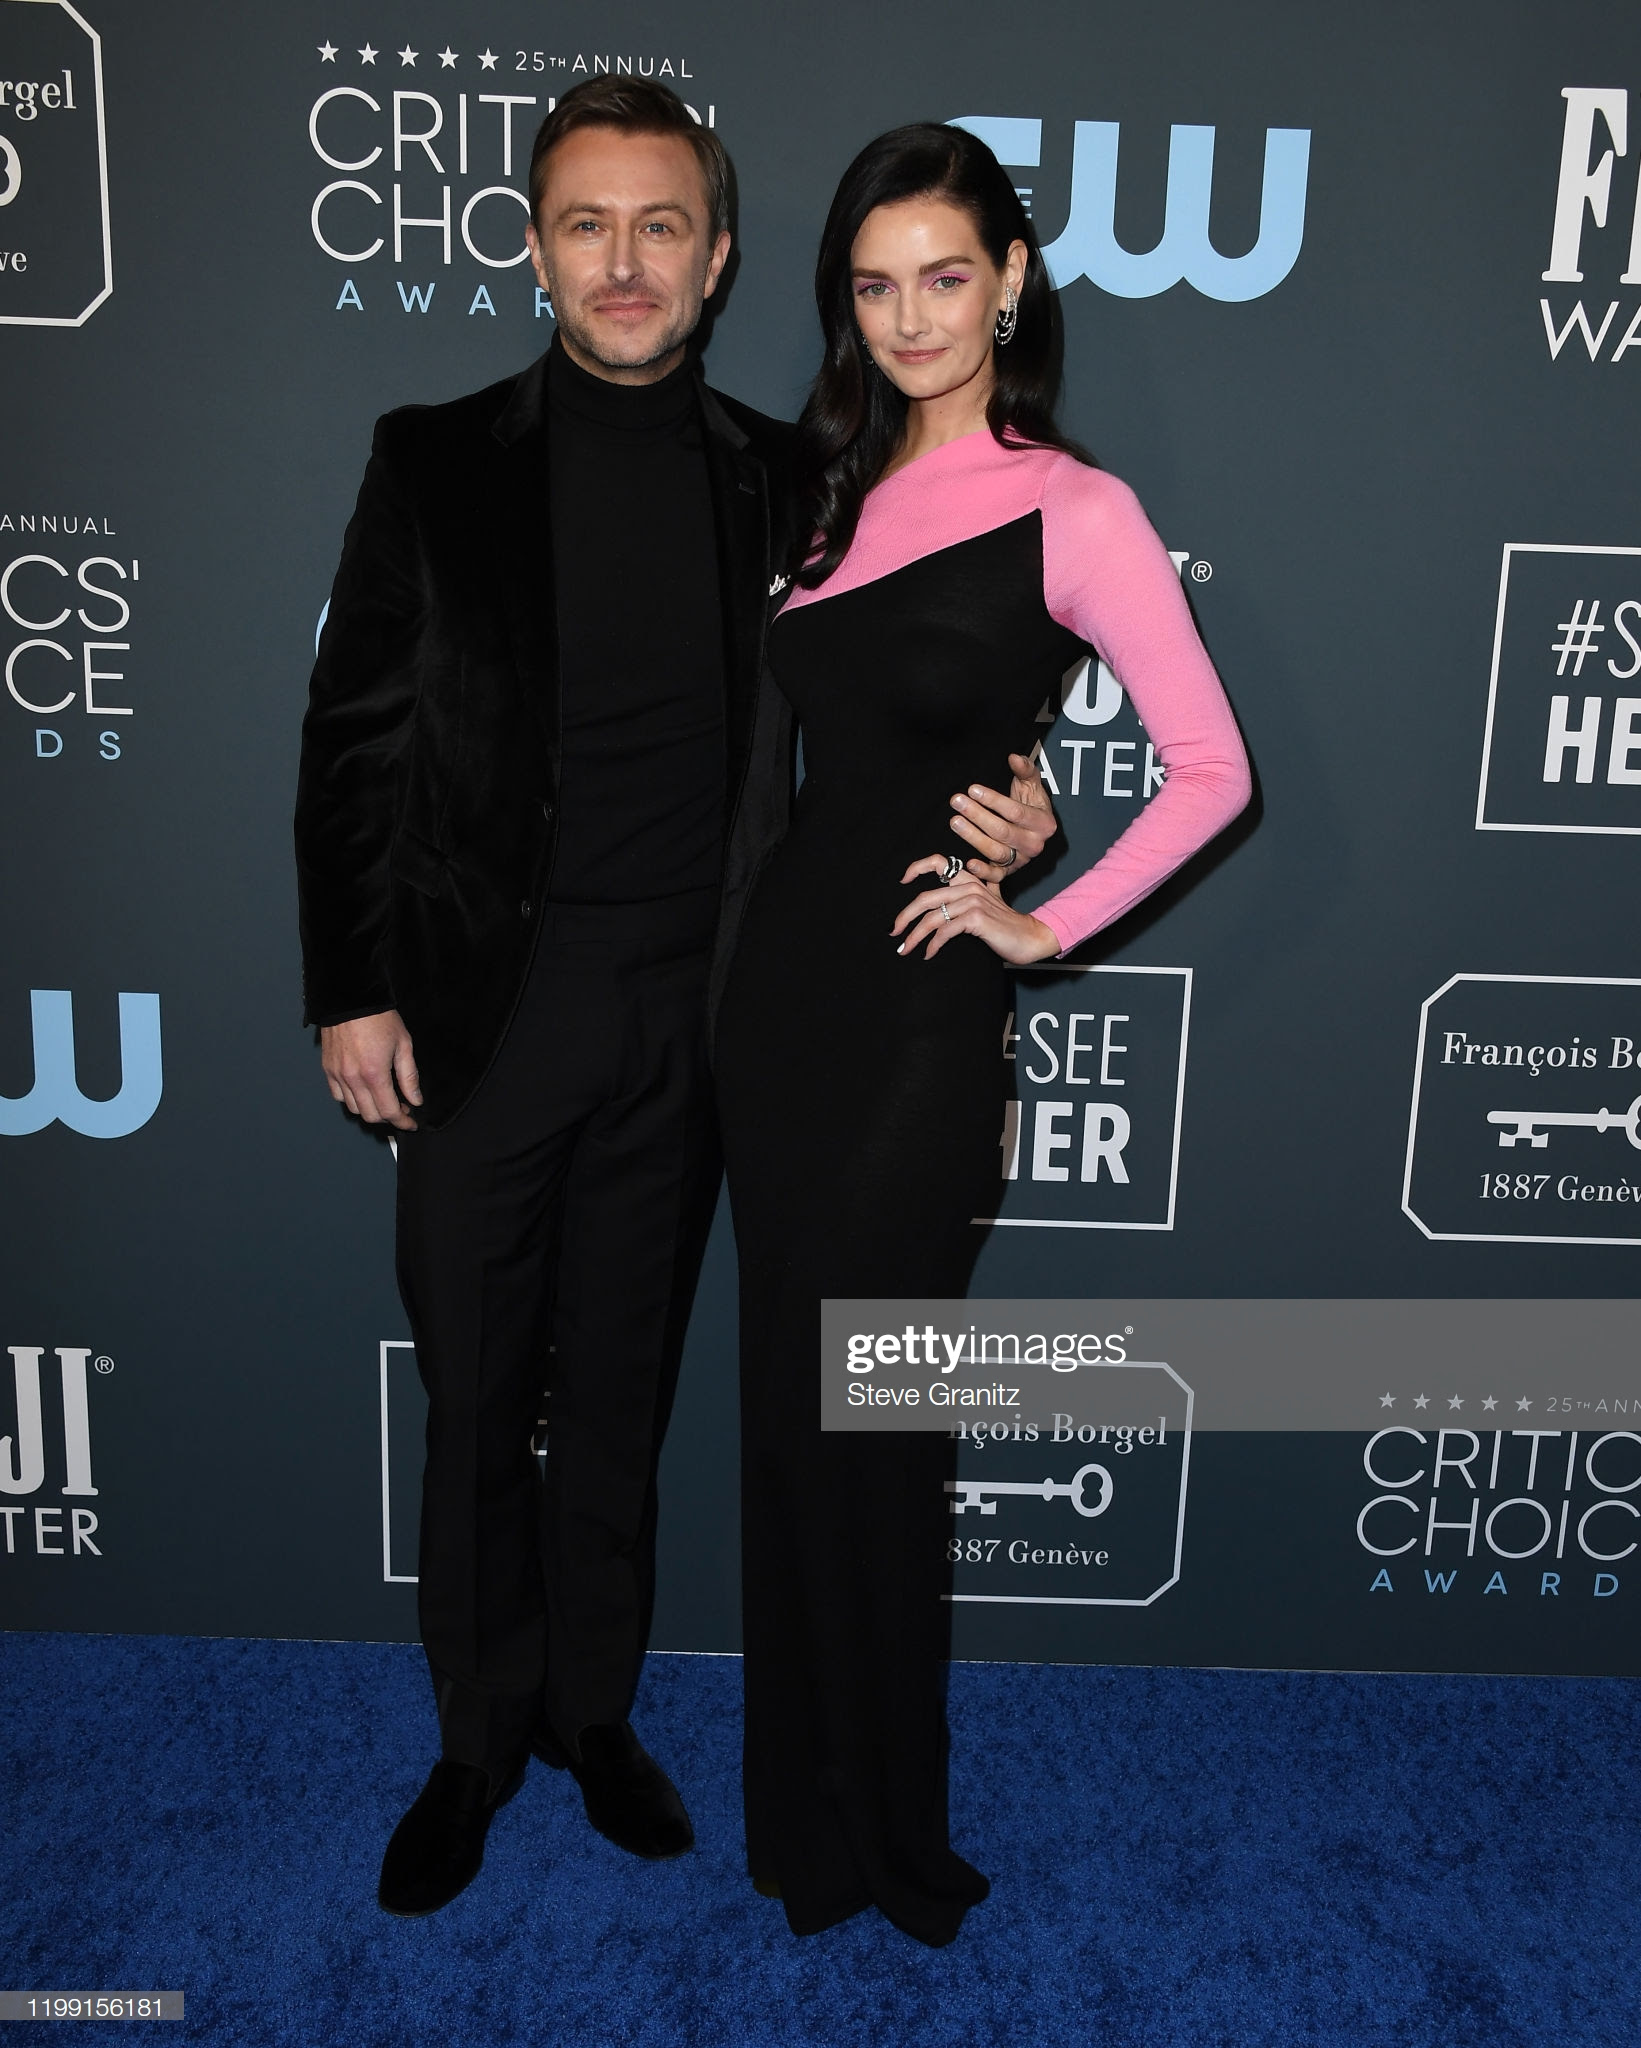 183a4f3e b68f 4513 a04f 01781247a64b - Jennifer Lopez y Emily,entre las celebrities que apostaron por Jimmy Choo en los Critics' Choice Awards